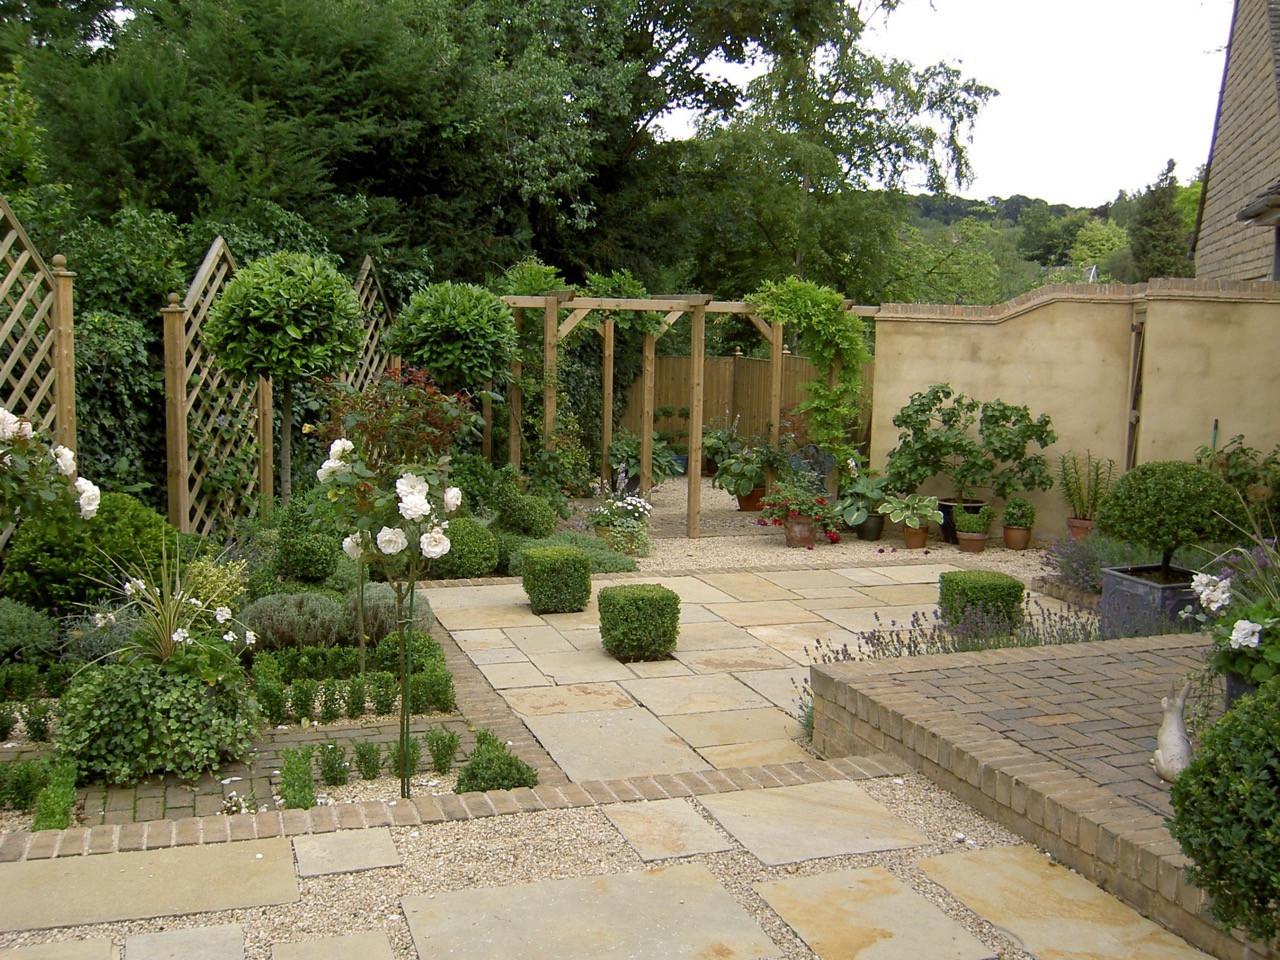 paving with topiary and pergolas.jpeg